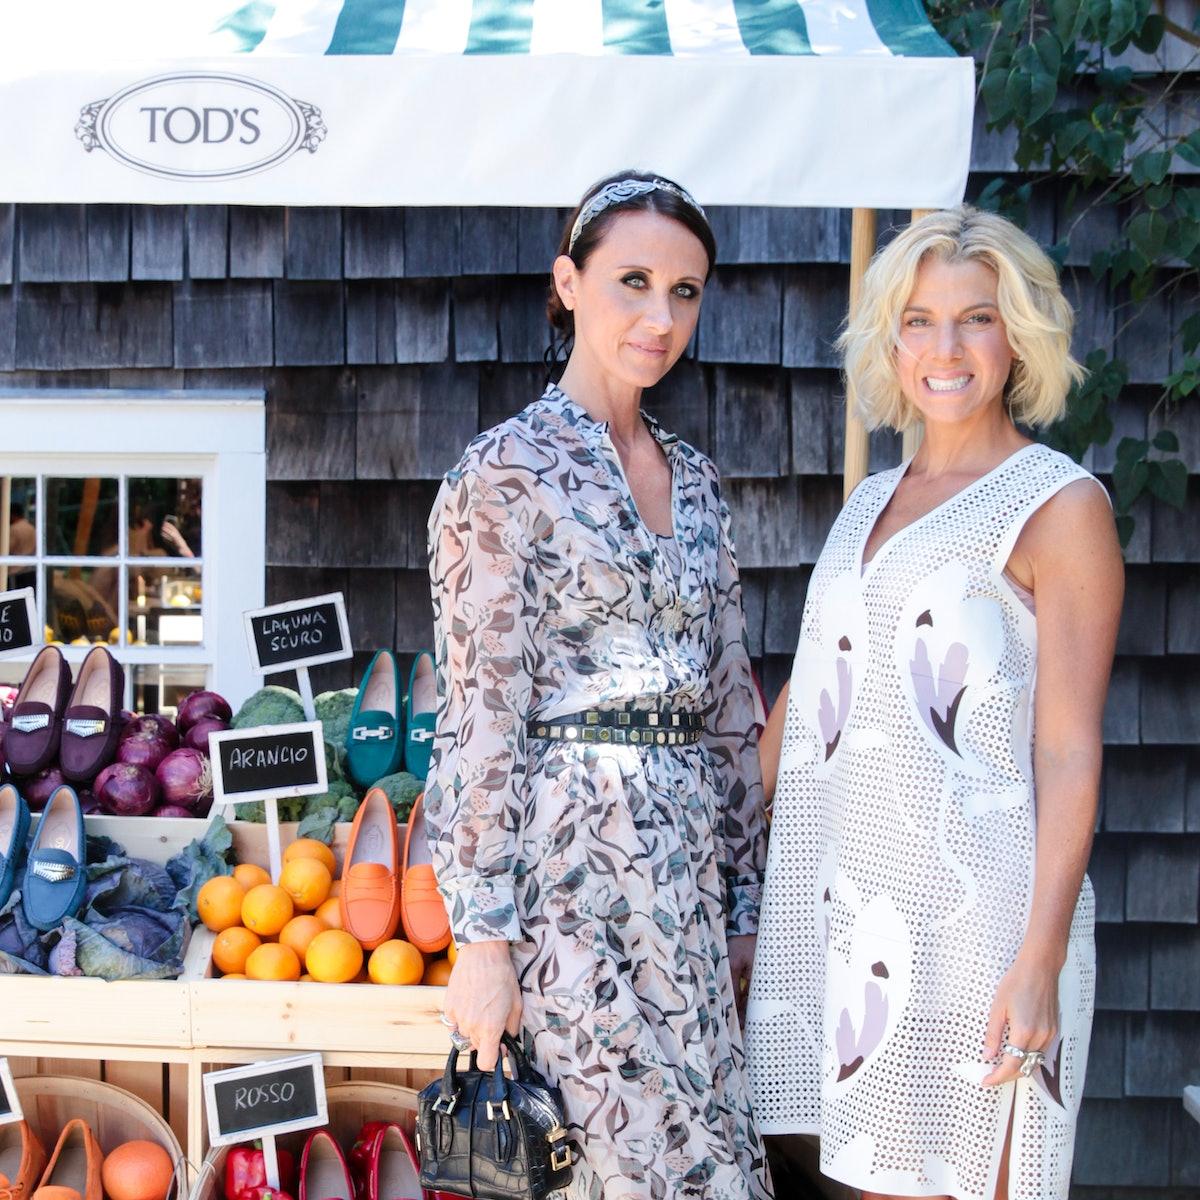 Alessandra Facchinetti and Jessica Seinfeld. Photo by bfanyc.com.